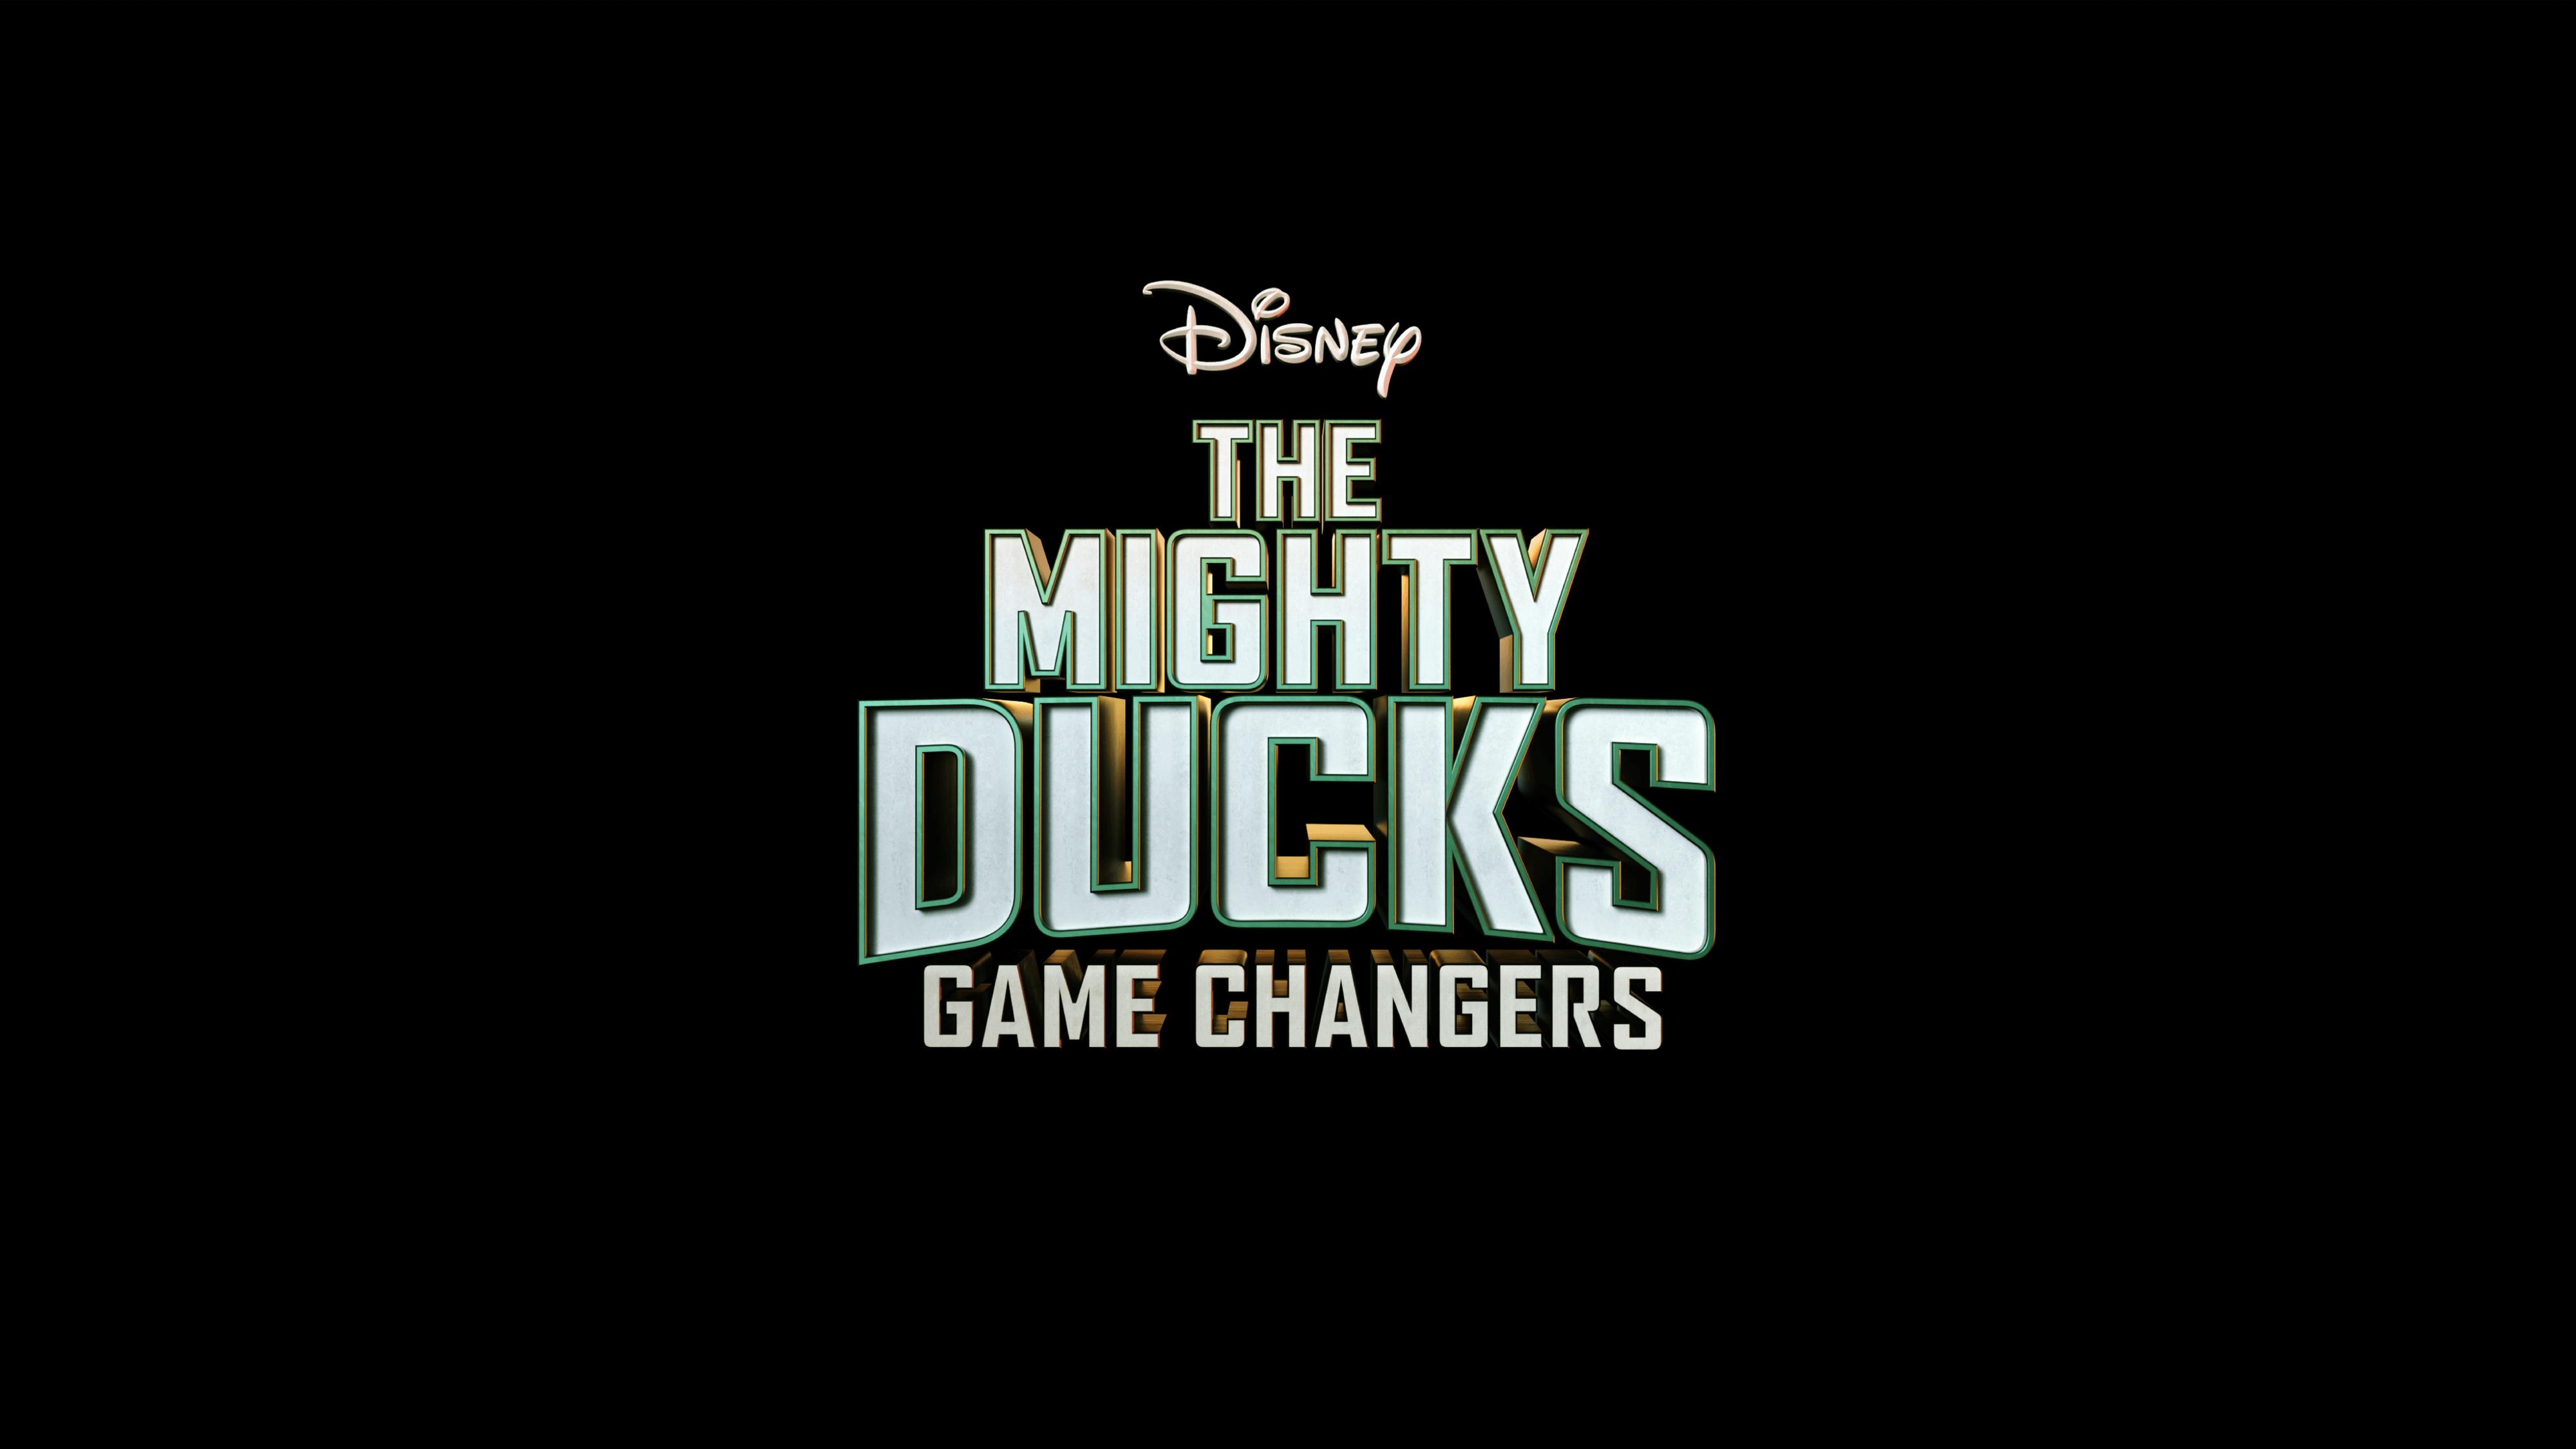 Disney+ The Mighty Ducks